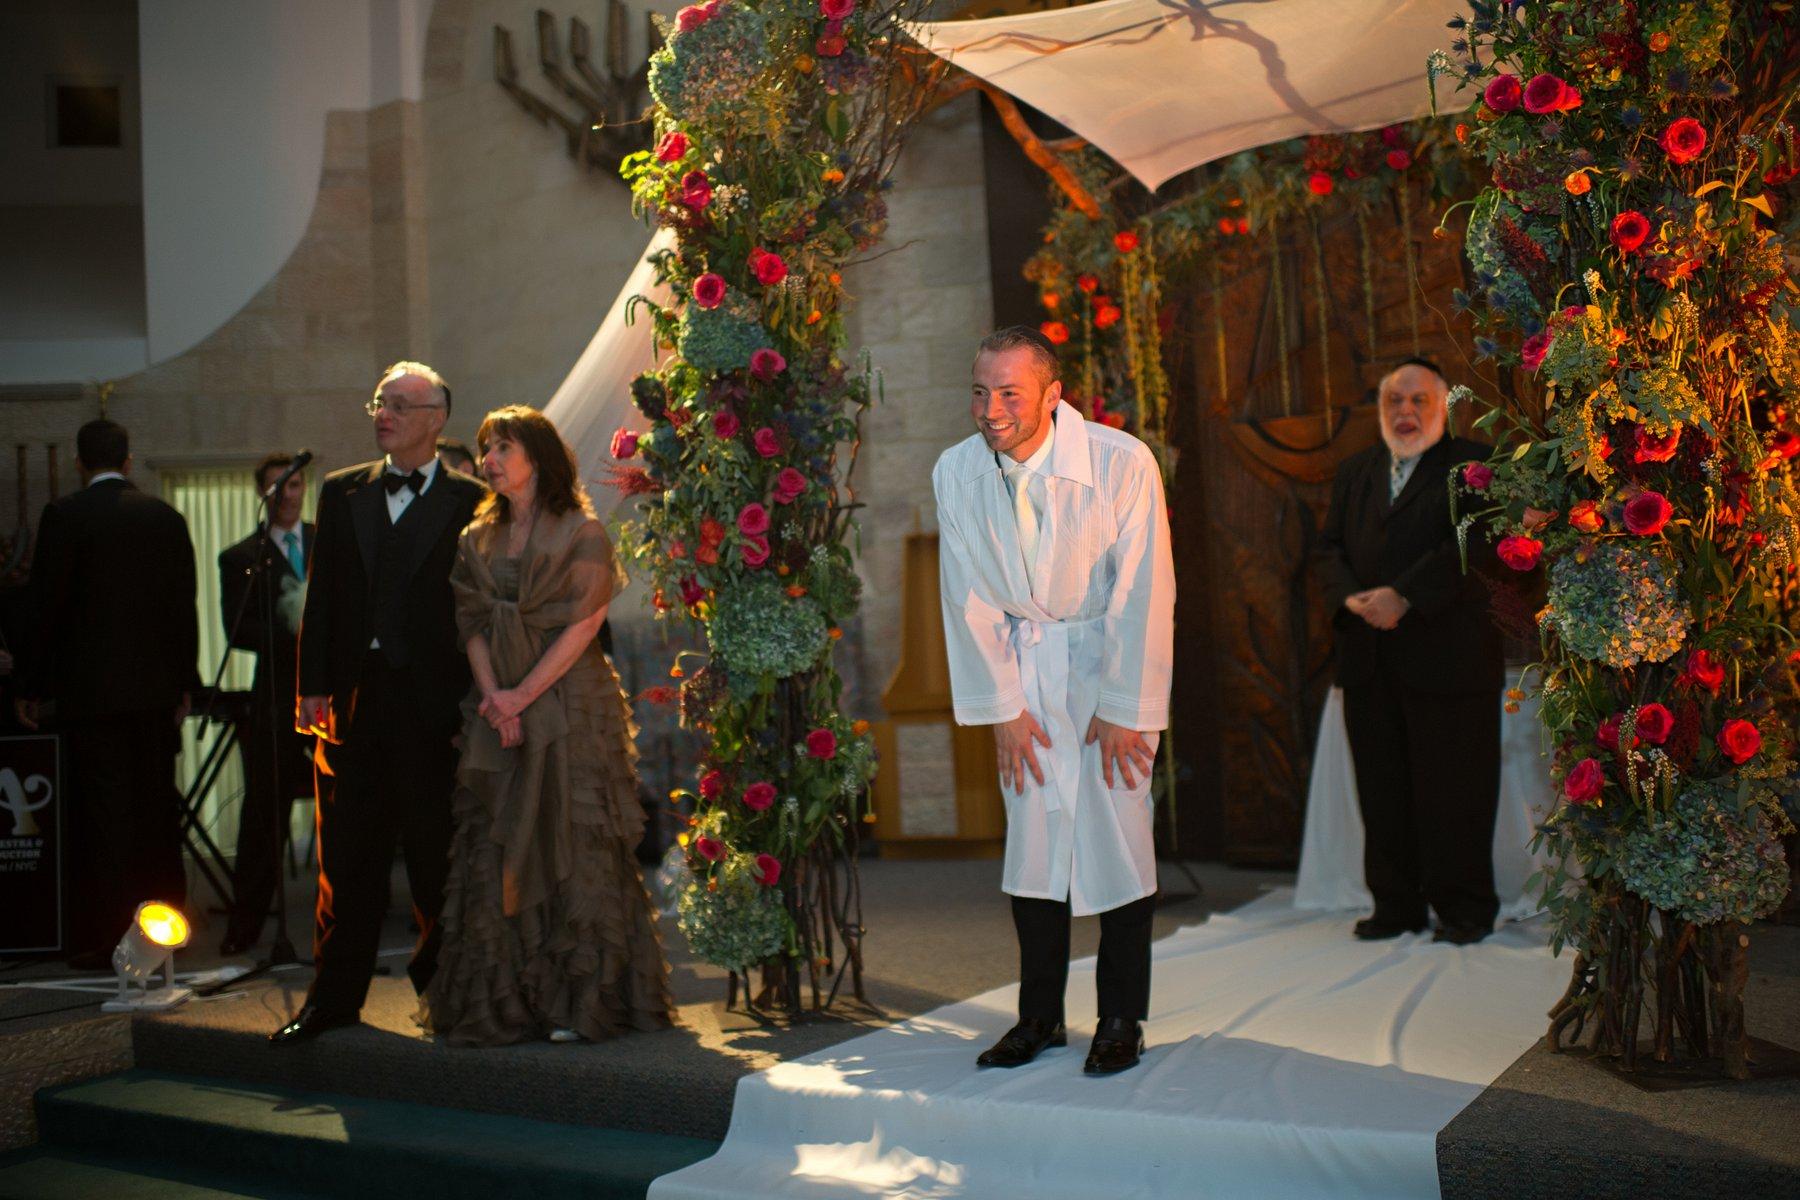 Aliza | Beth Torah Benny Rok Campus | Ortodox Jewish Wedding Photos, Miami, Miami Wedding Photographers | Häring Photography, Indian Wedding Photographer in Florida, Best Muslim, Hindu - South East Asian Wedding Photographers